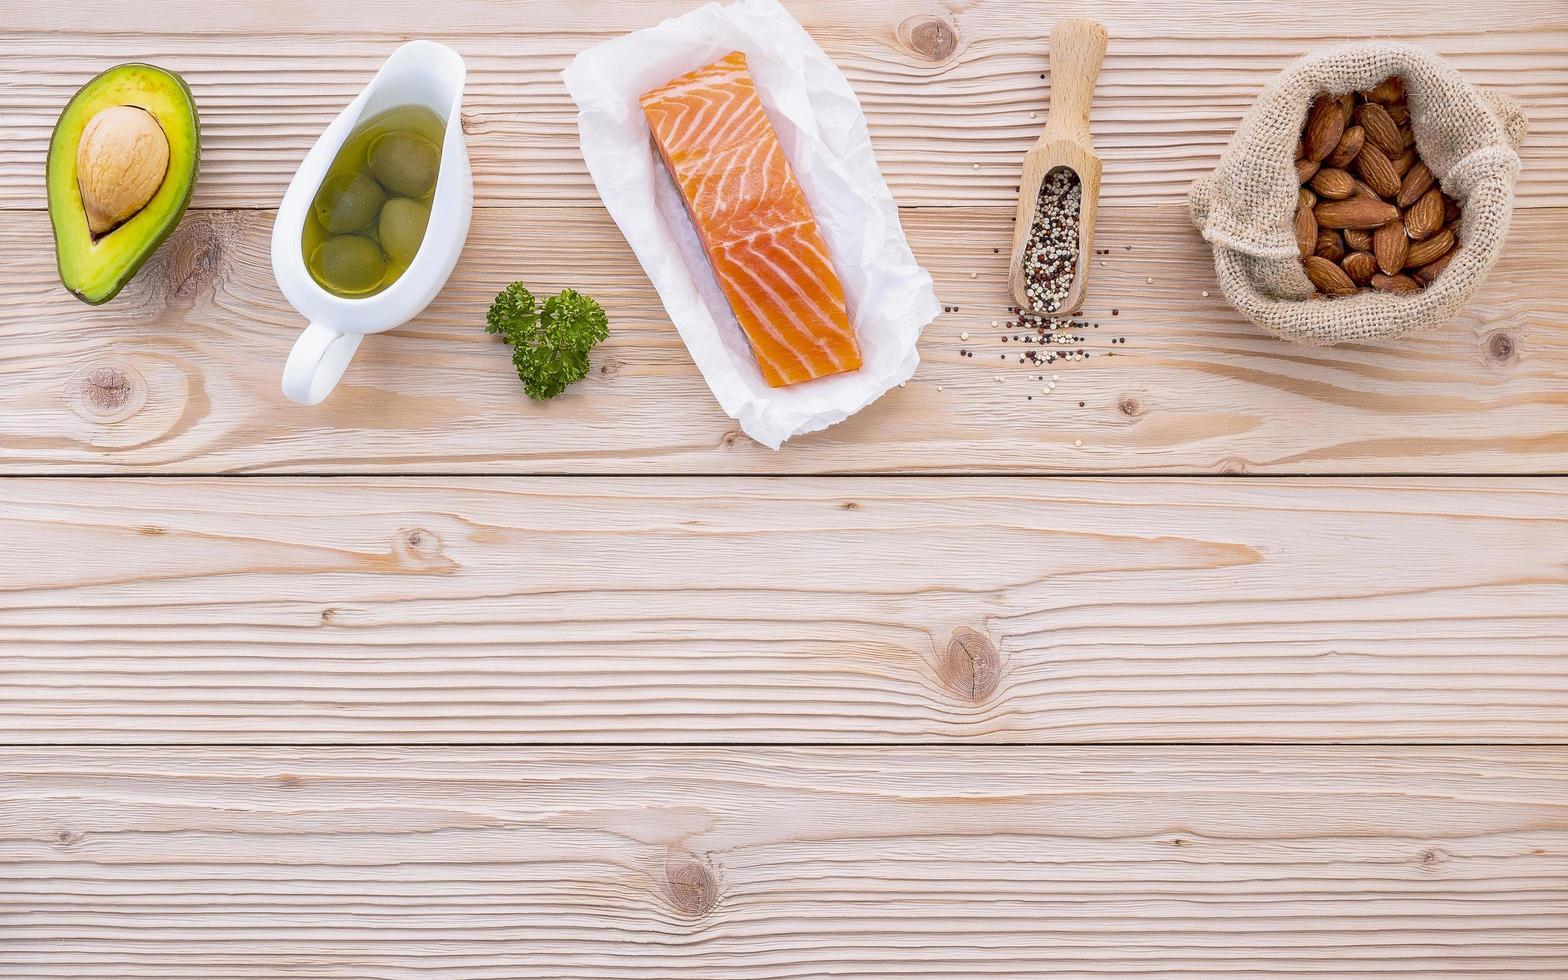 Healthy food items on light wood photo